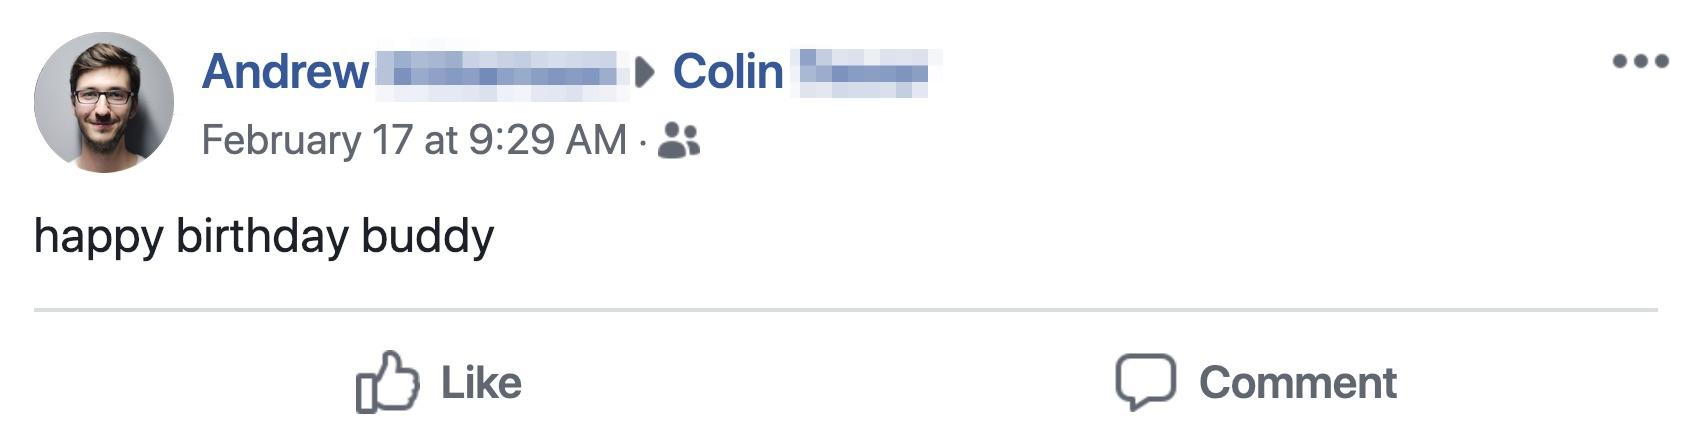 Facebook wall birthday message